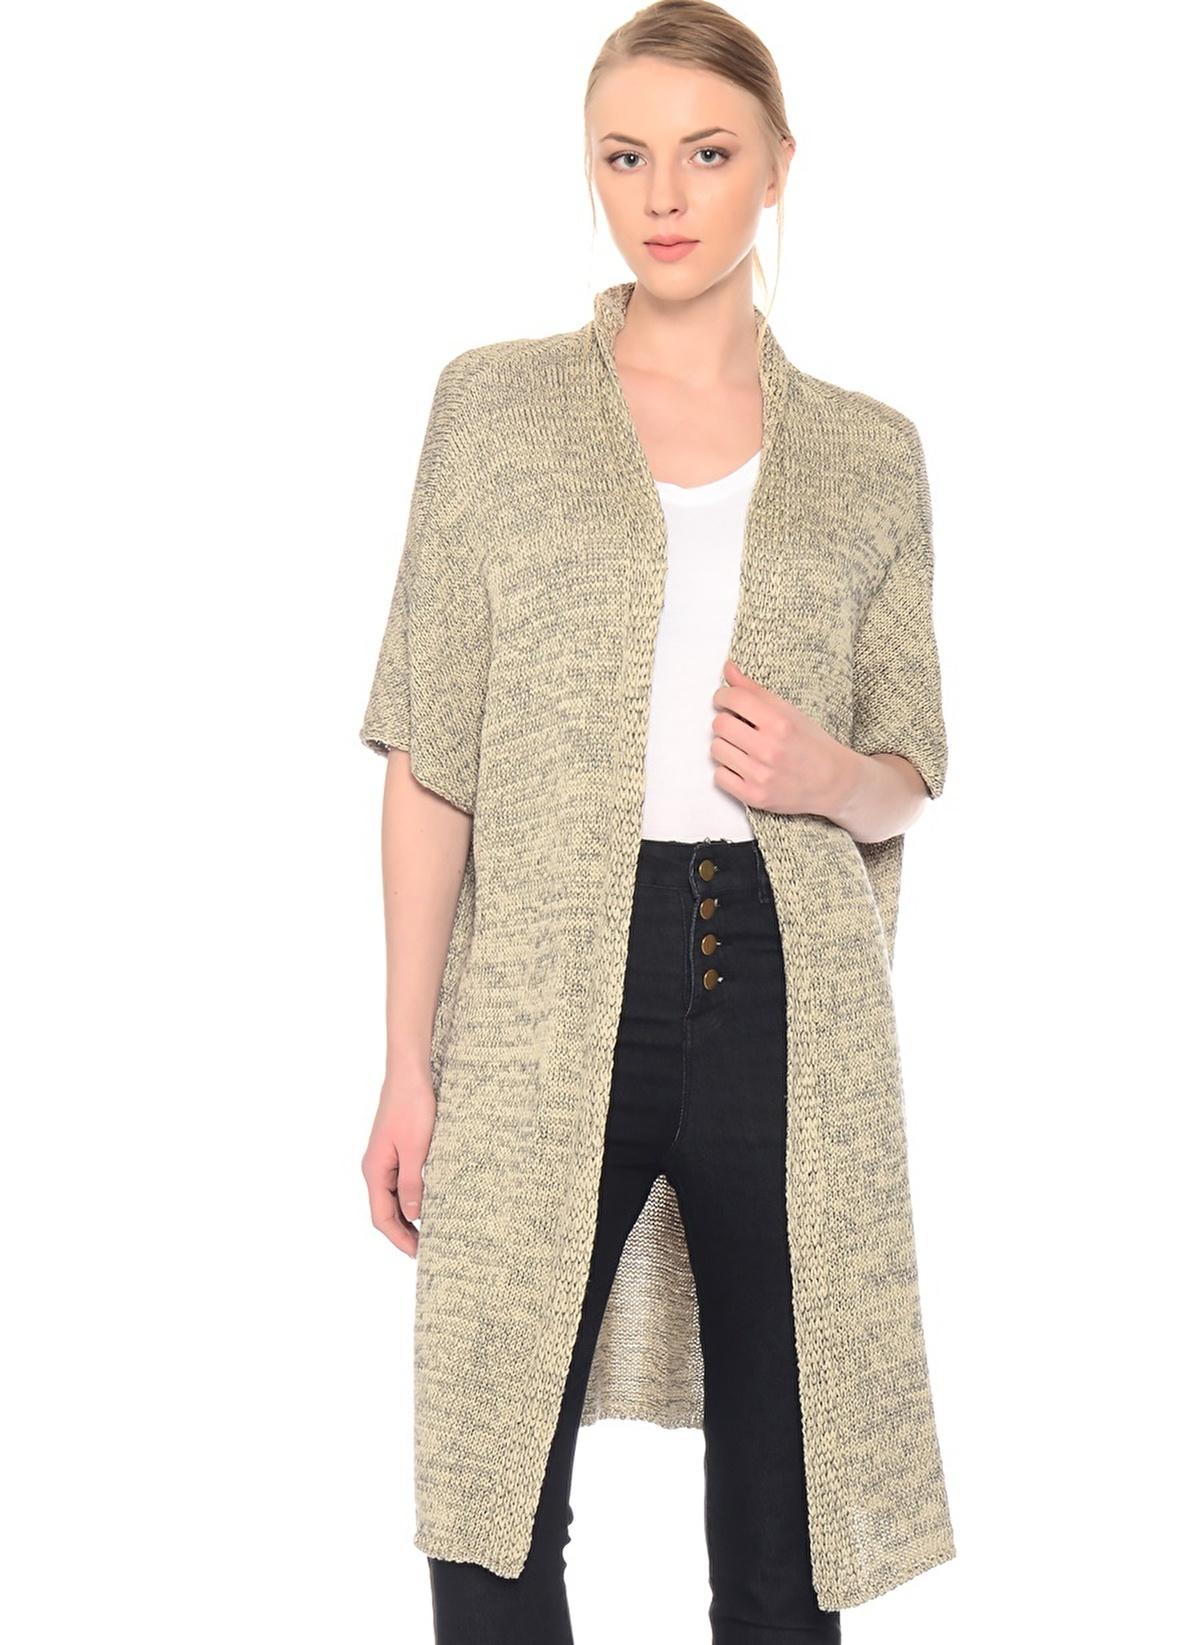 Fridays Project Hırka 13691 Long Cardigan Kimono Sle – 59.99 TL